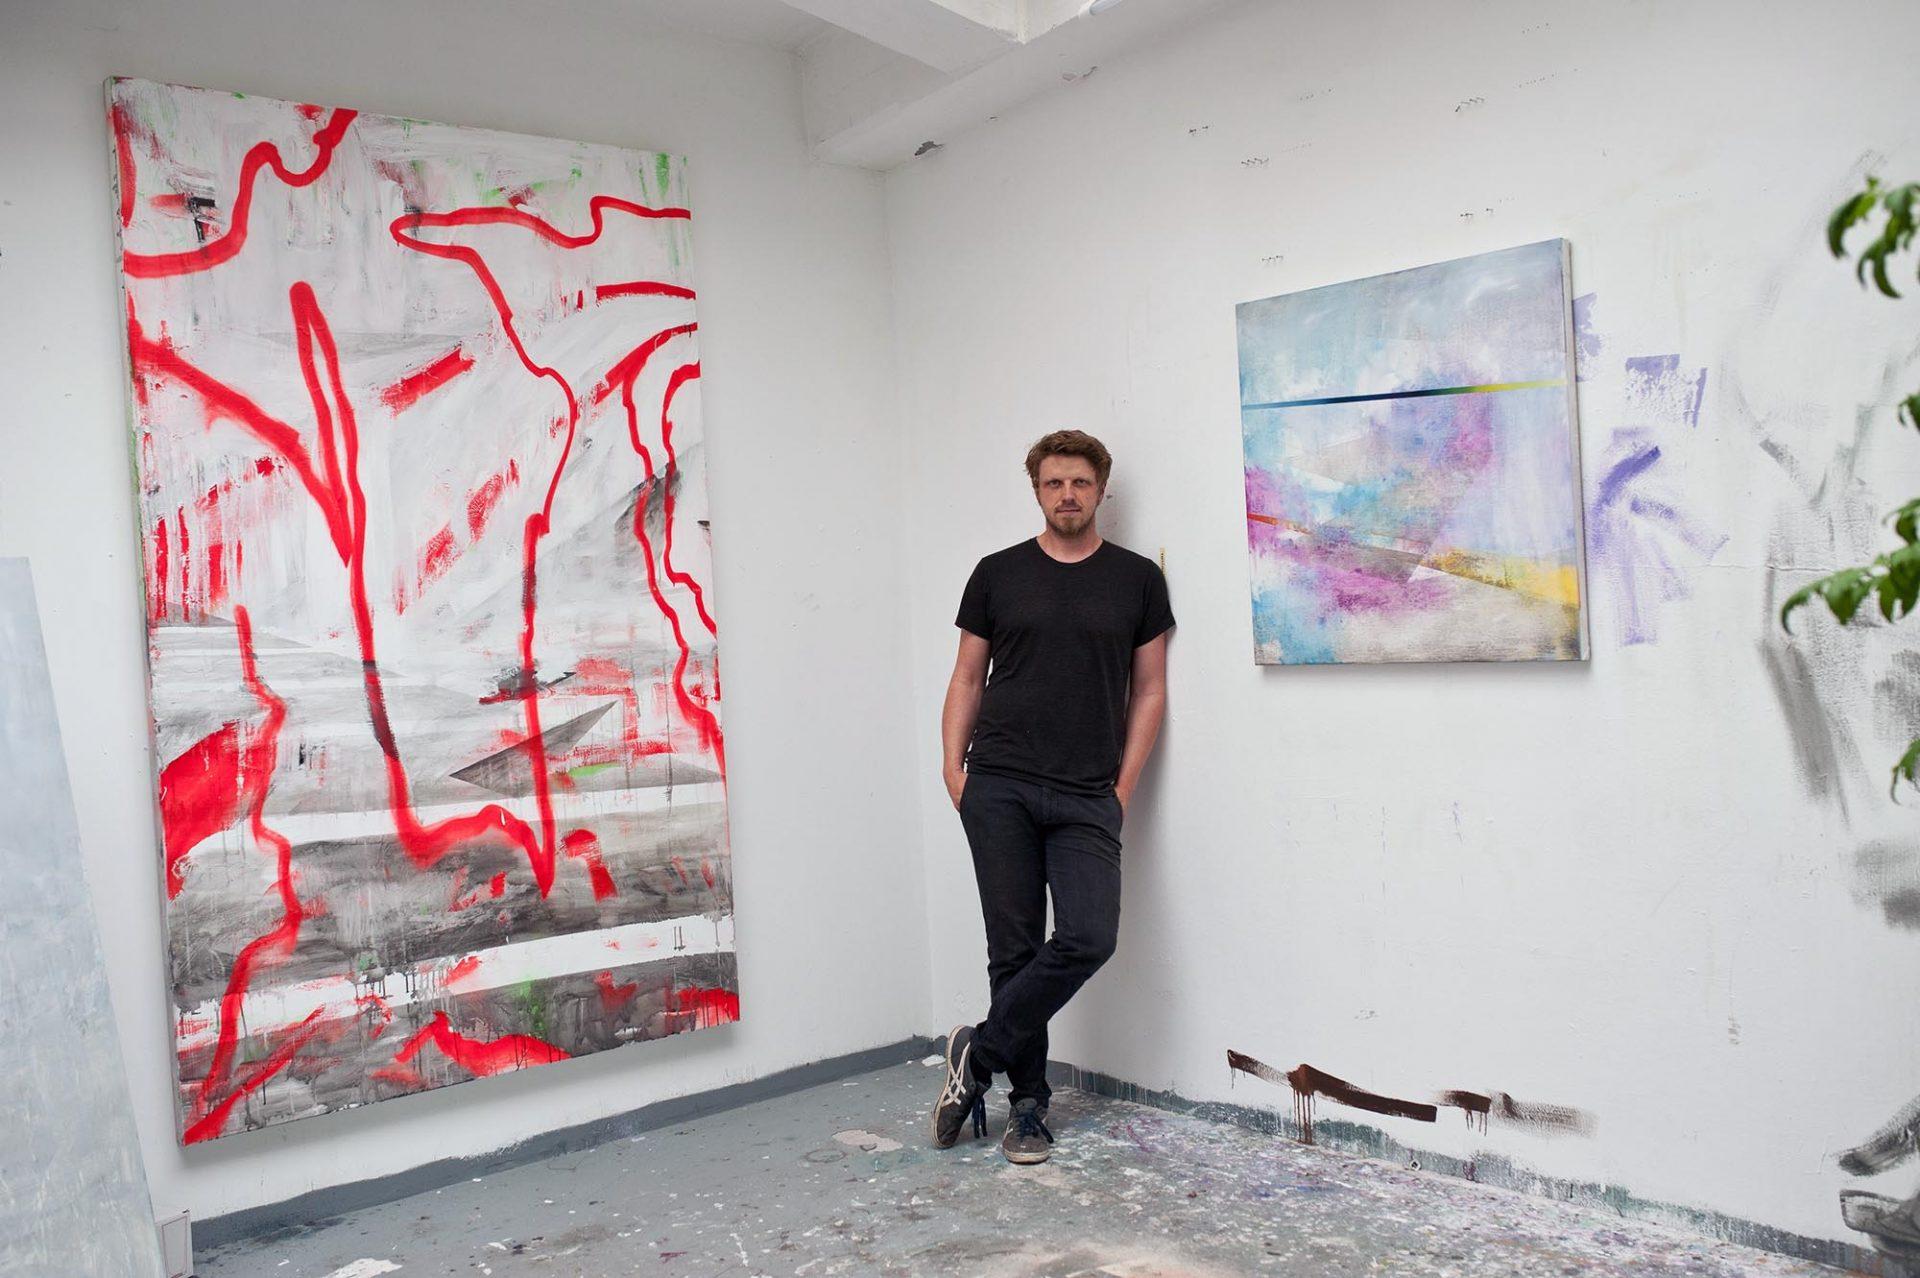 Daniel Wöllenstein.  Artist and first chairman of the association of the KunstWerk since 2016